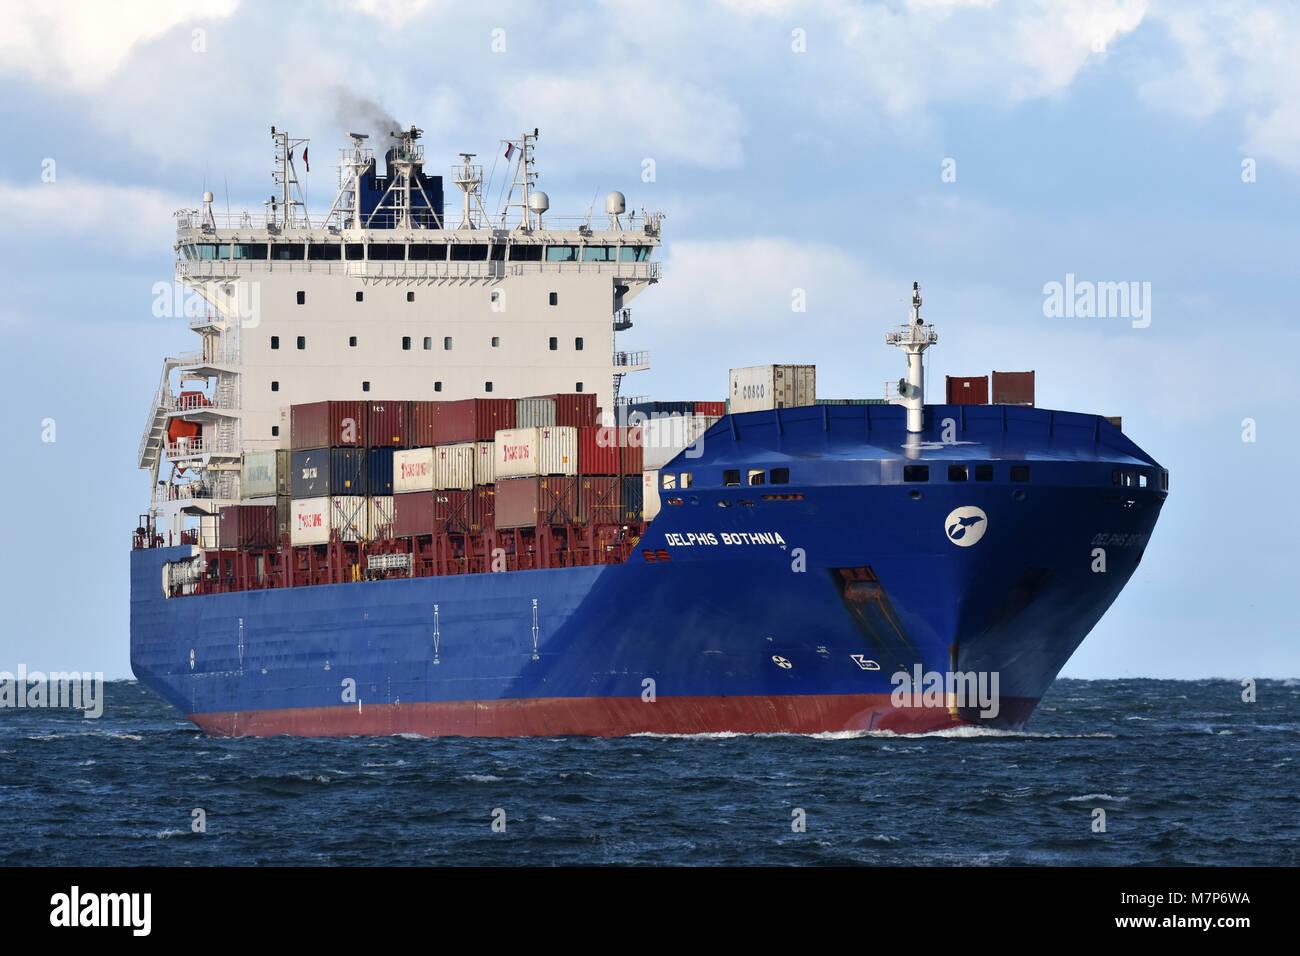 Feedervessel Delphis Bothnia heading for the Kiel Canal - Stock Image